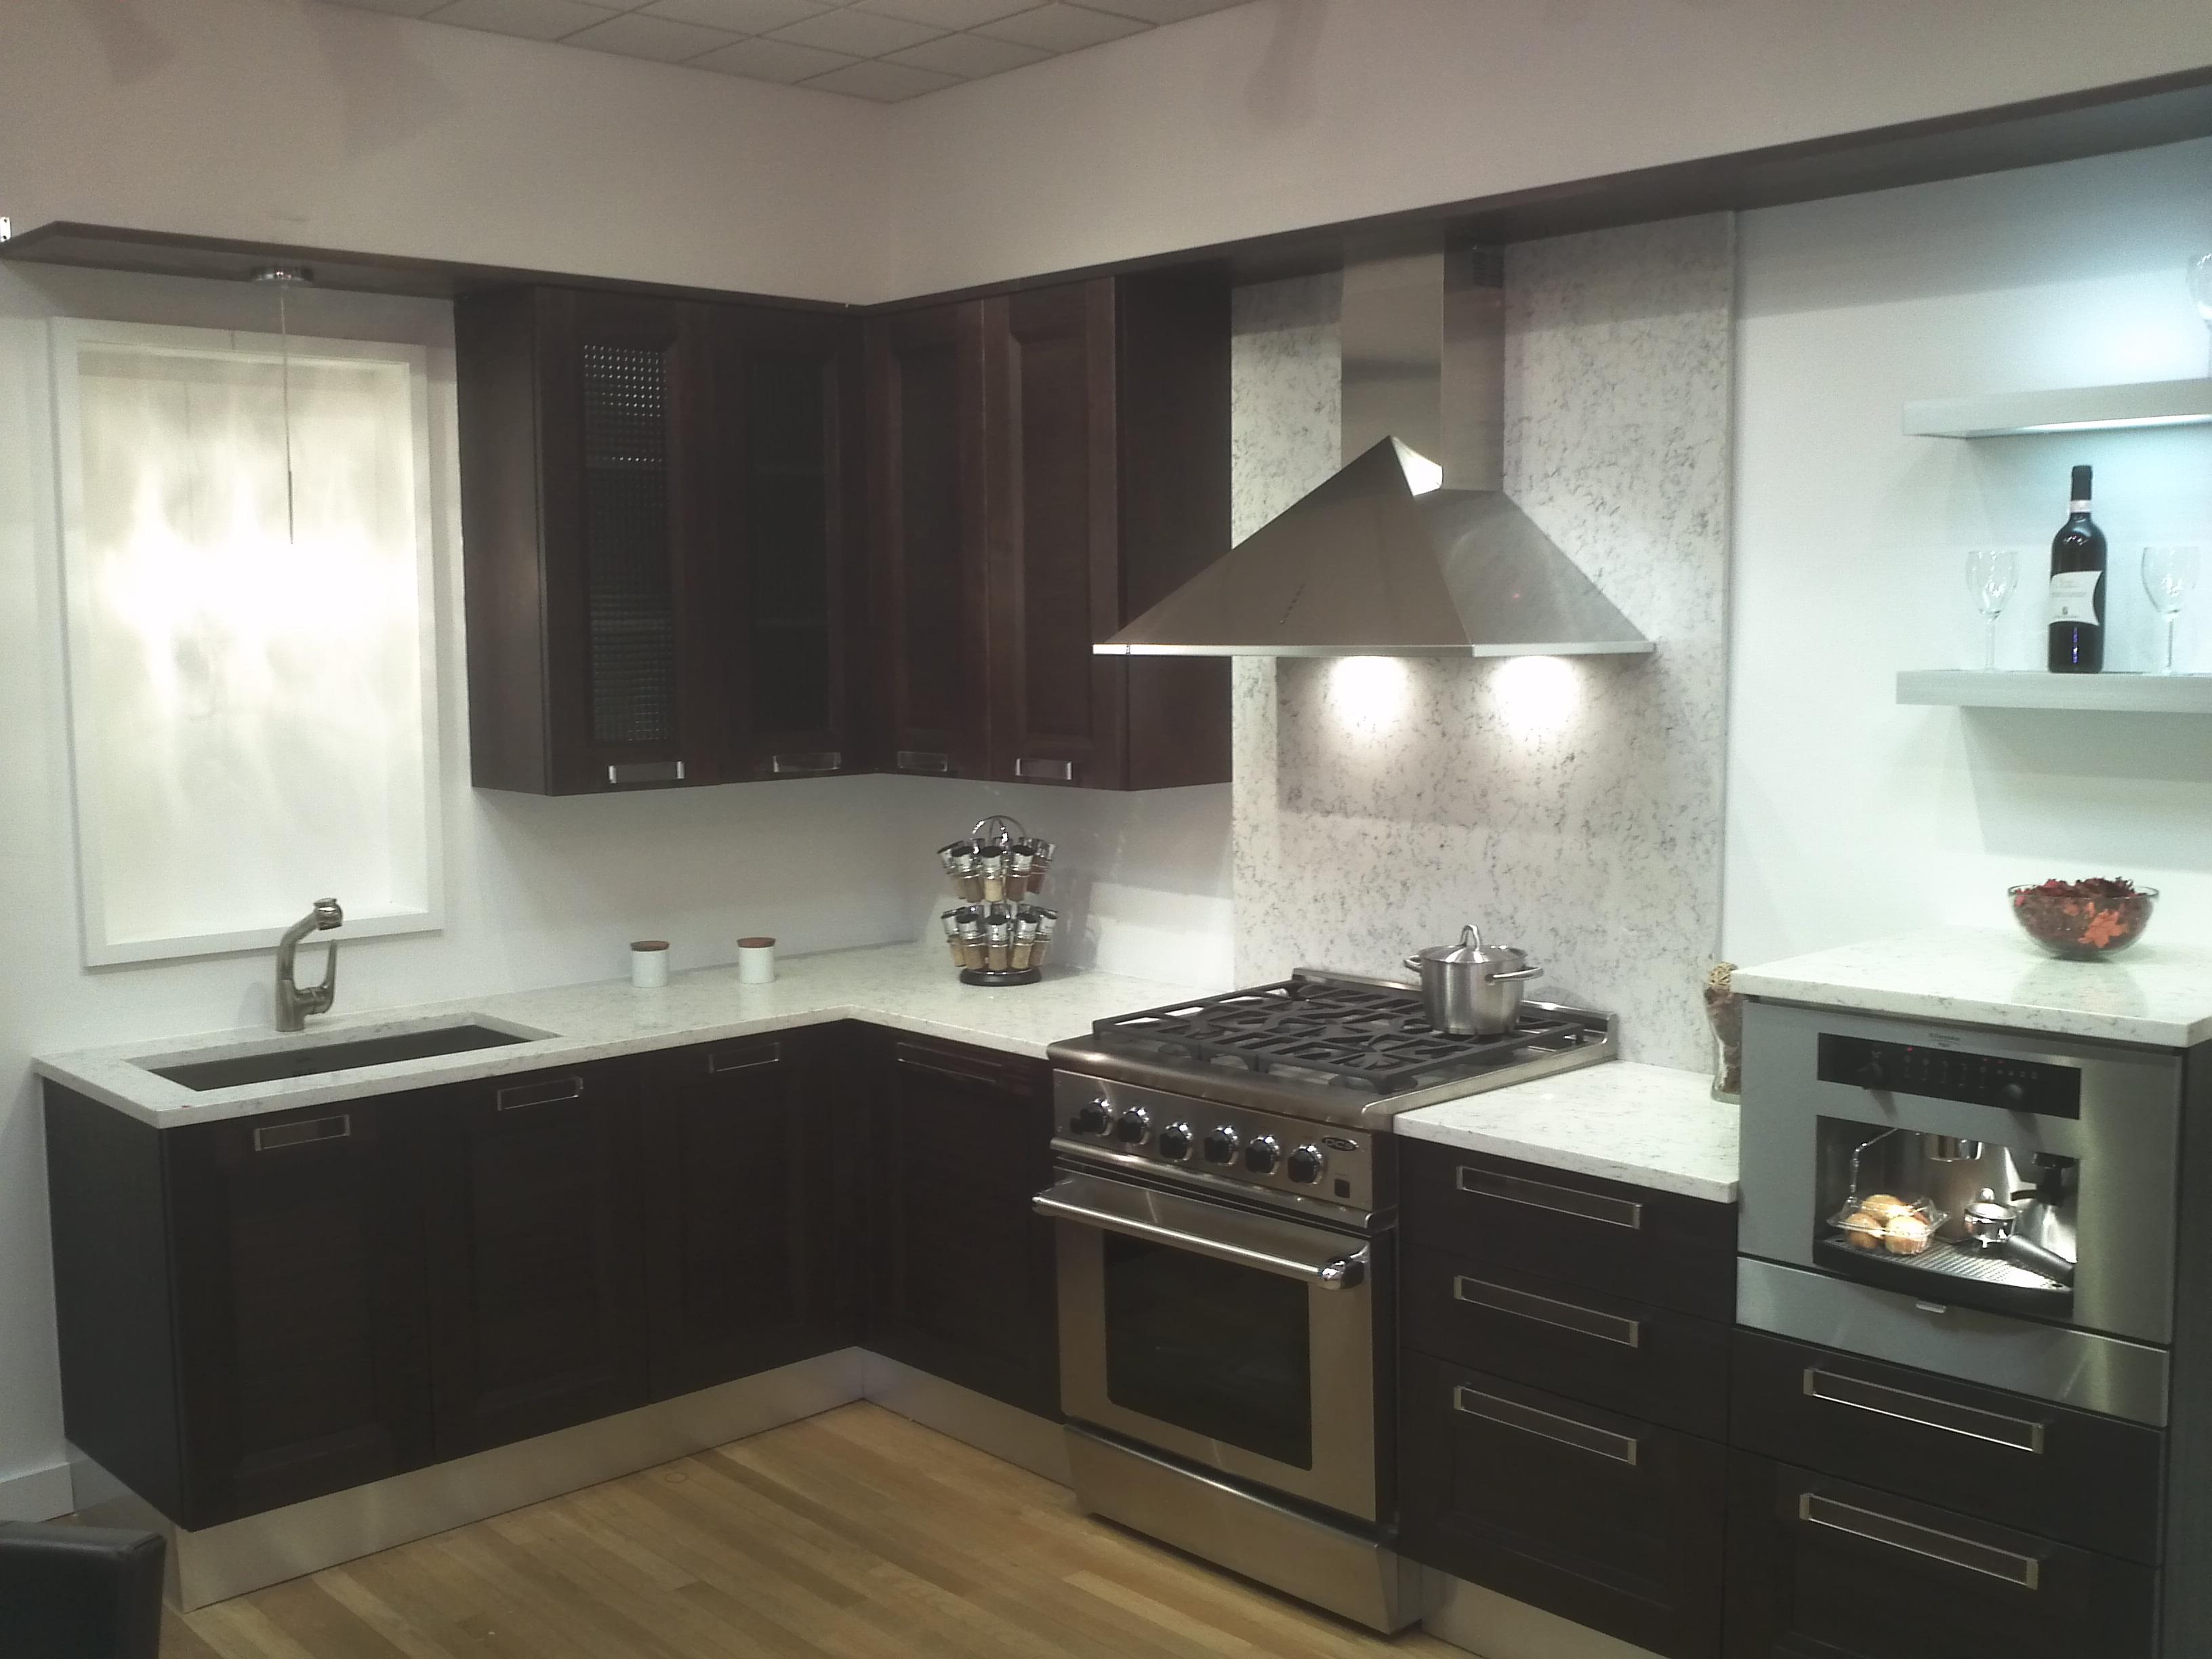 New Kitchen Display in Brooklyn NY Showroom | Artistic Kitchen Designs